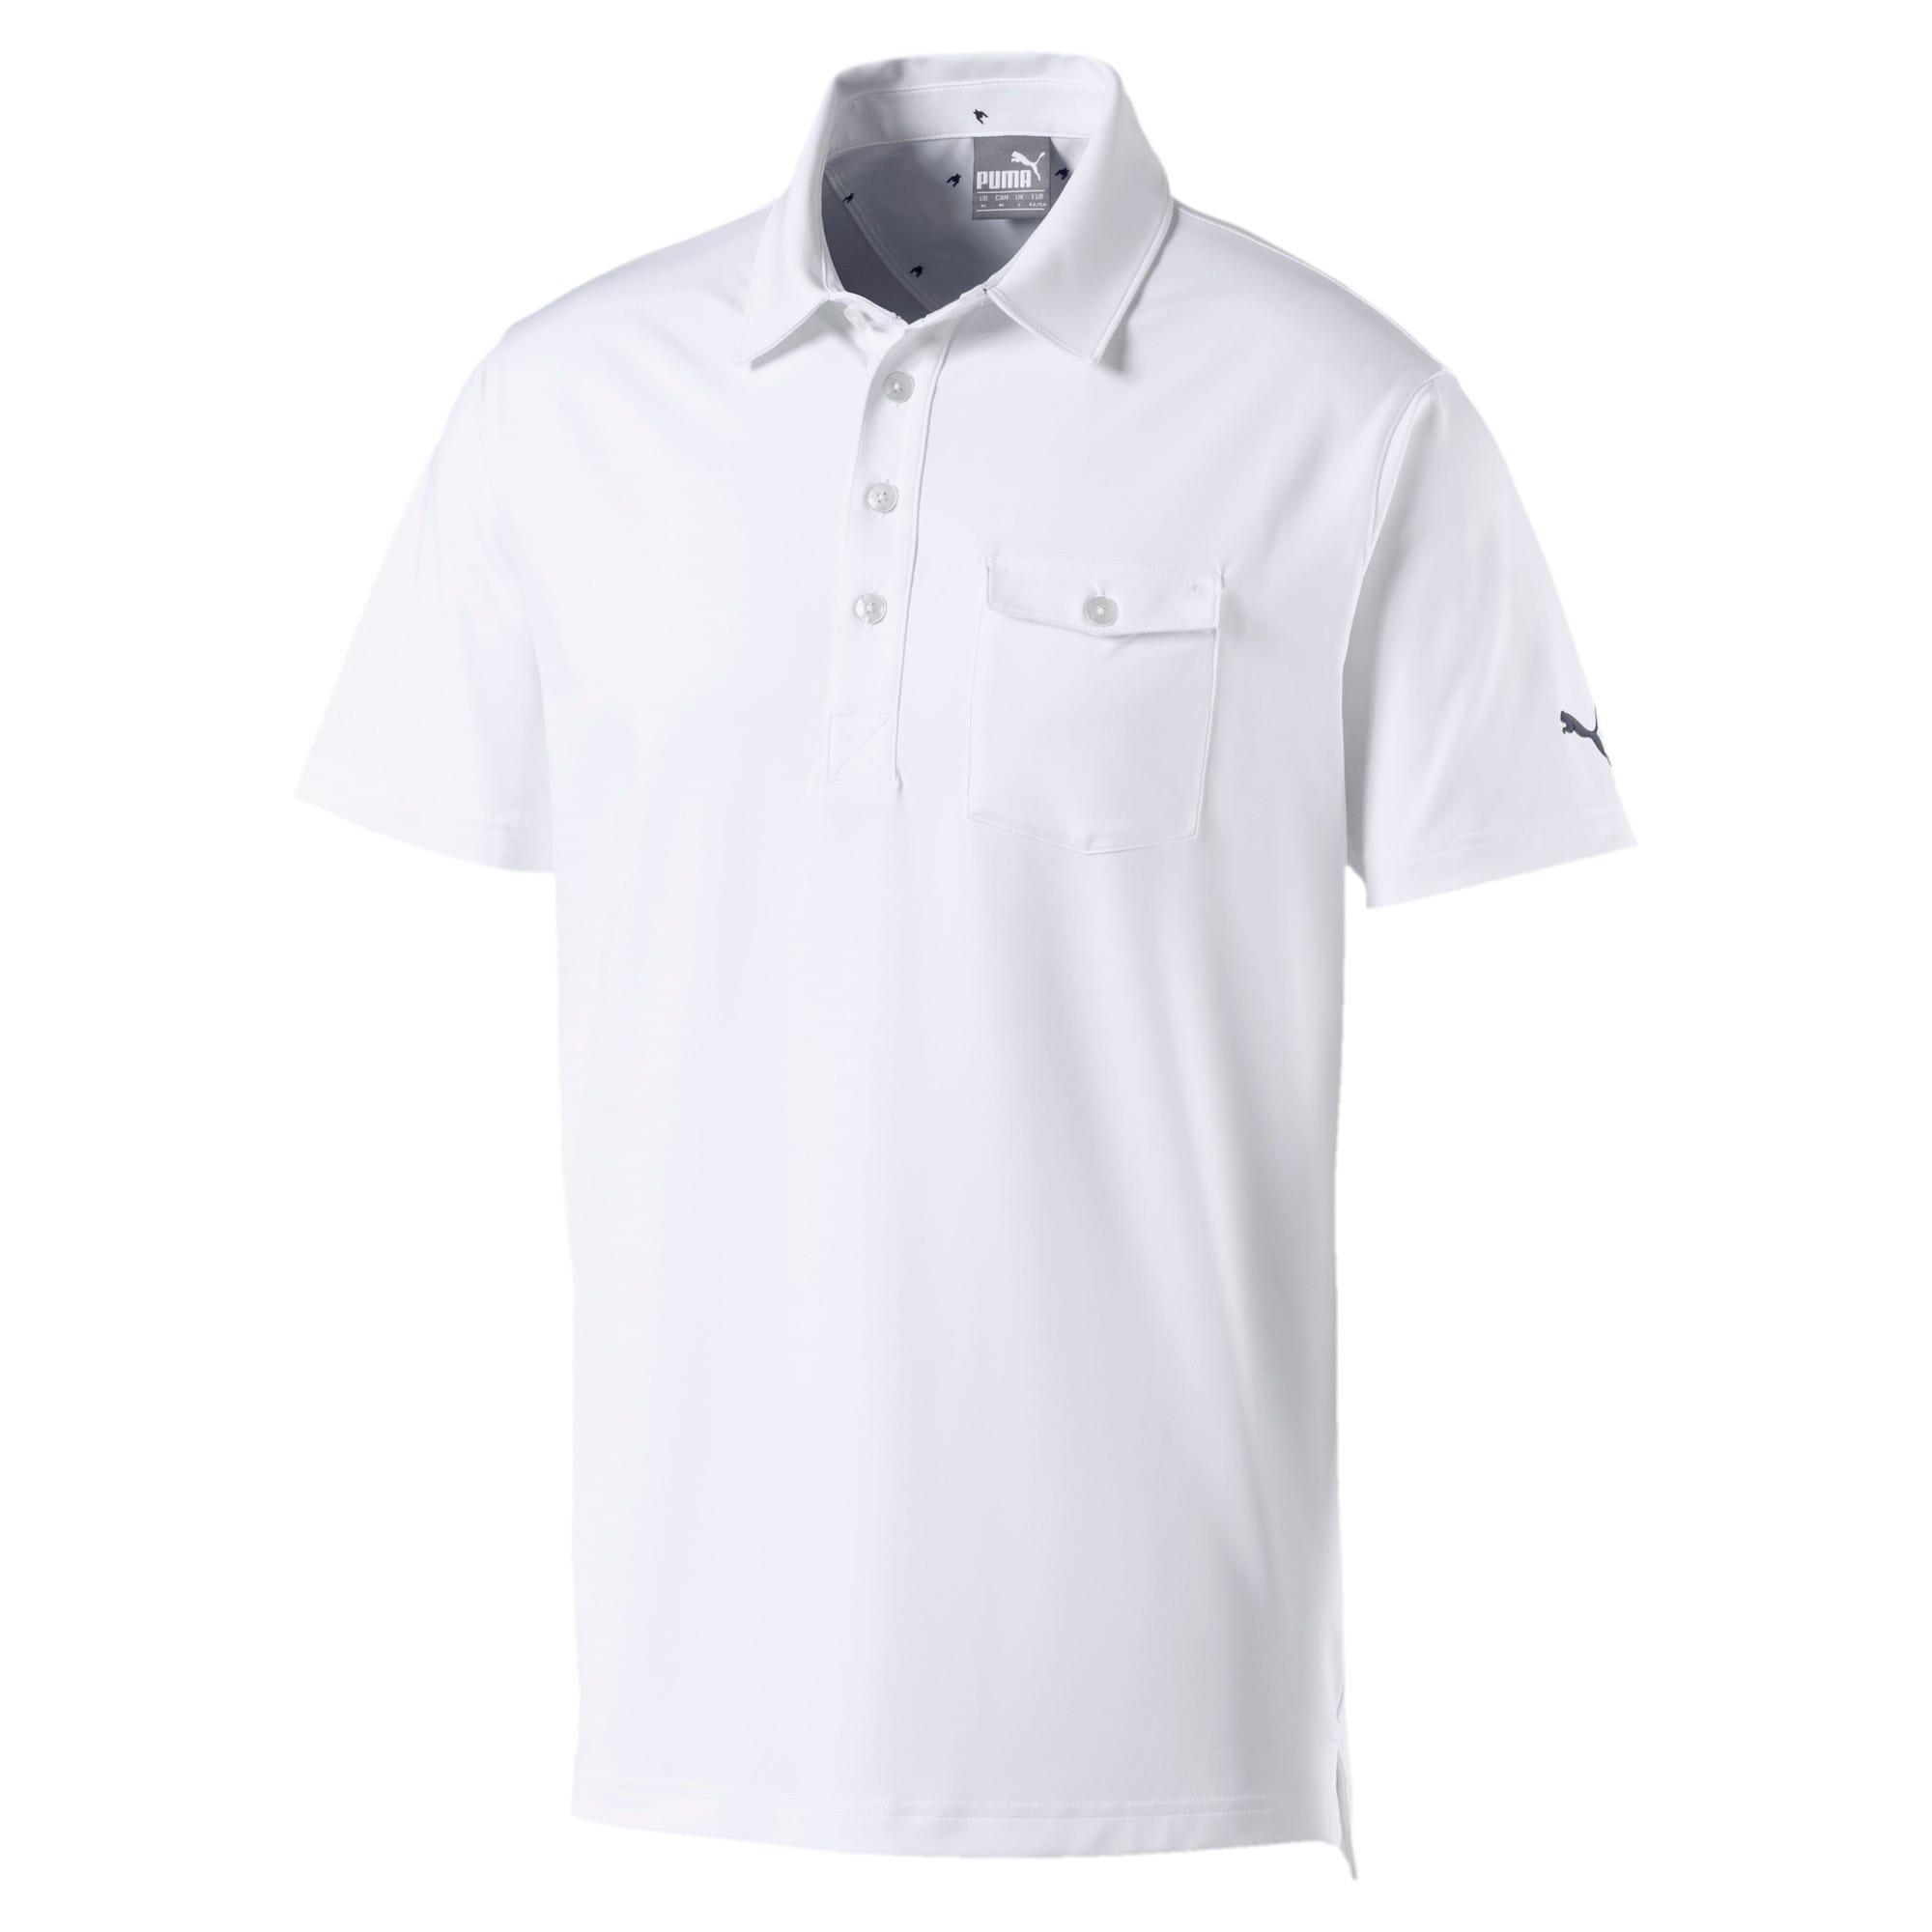 Thumbnail 5 of Donegal Men's Golf Polo, Bright White, medium